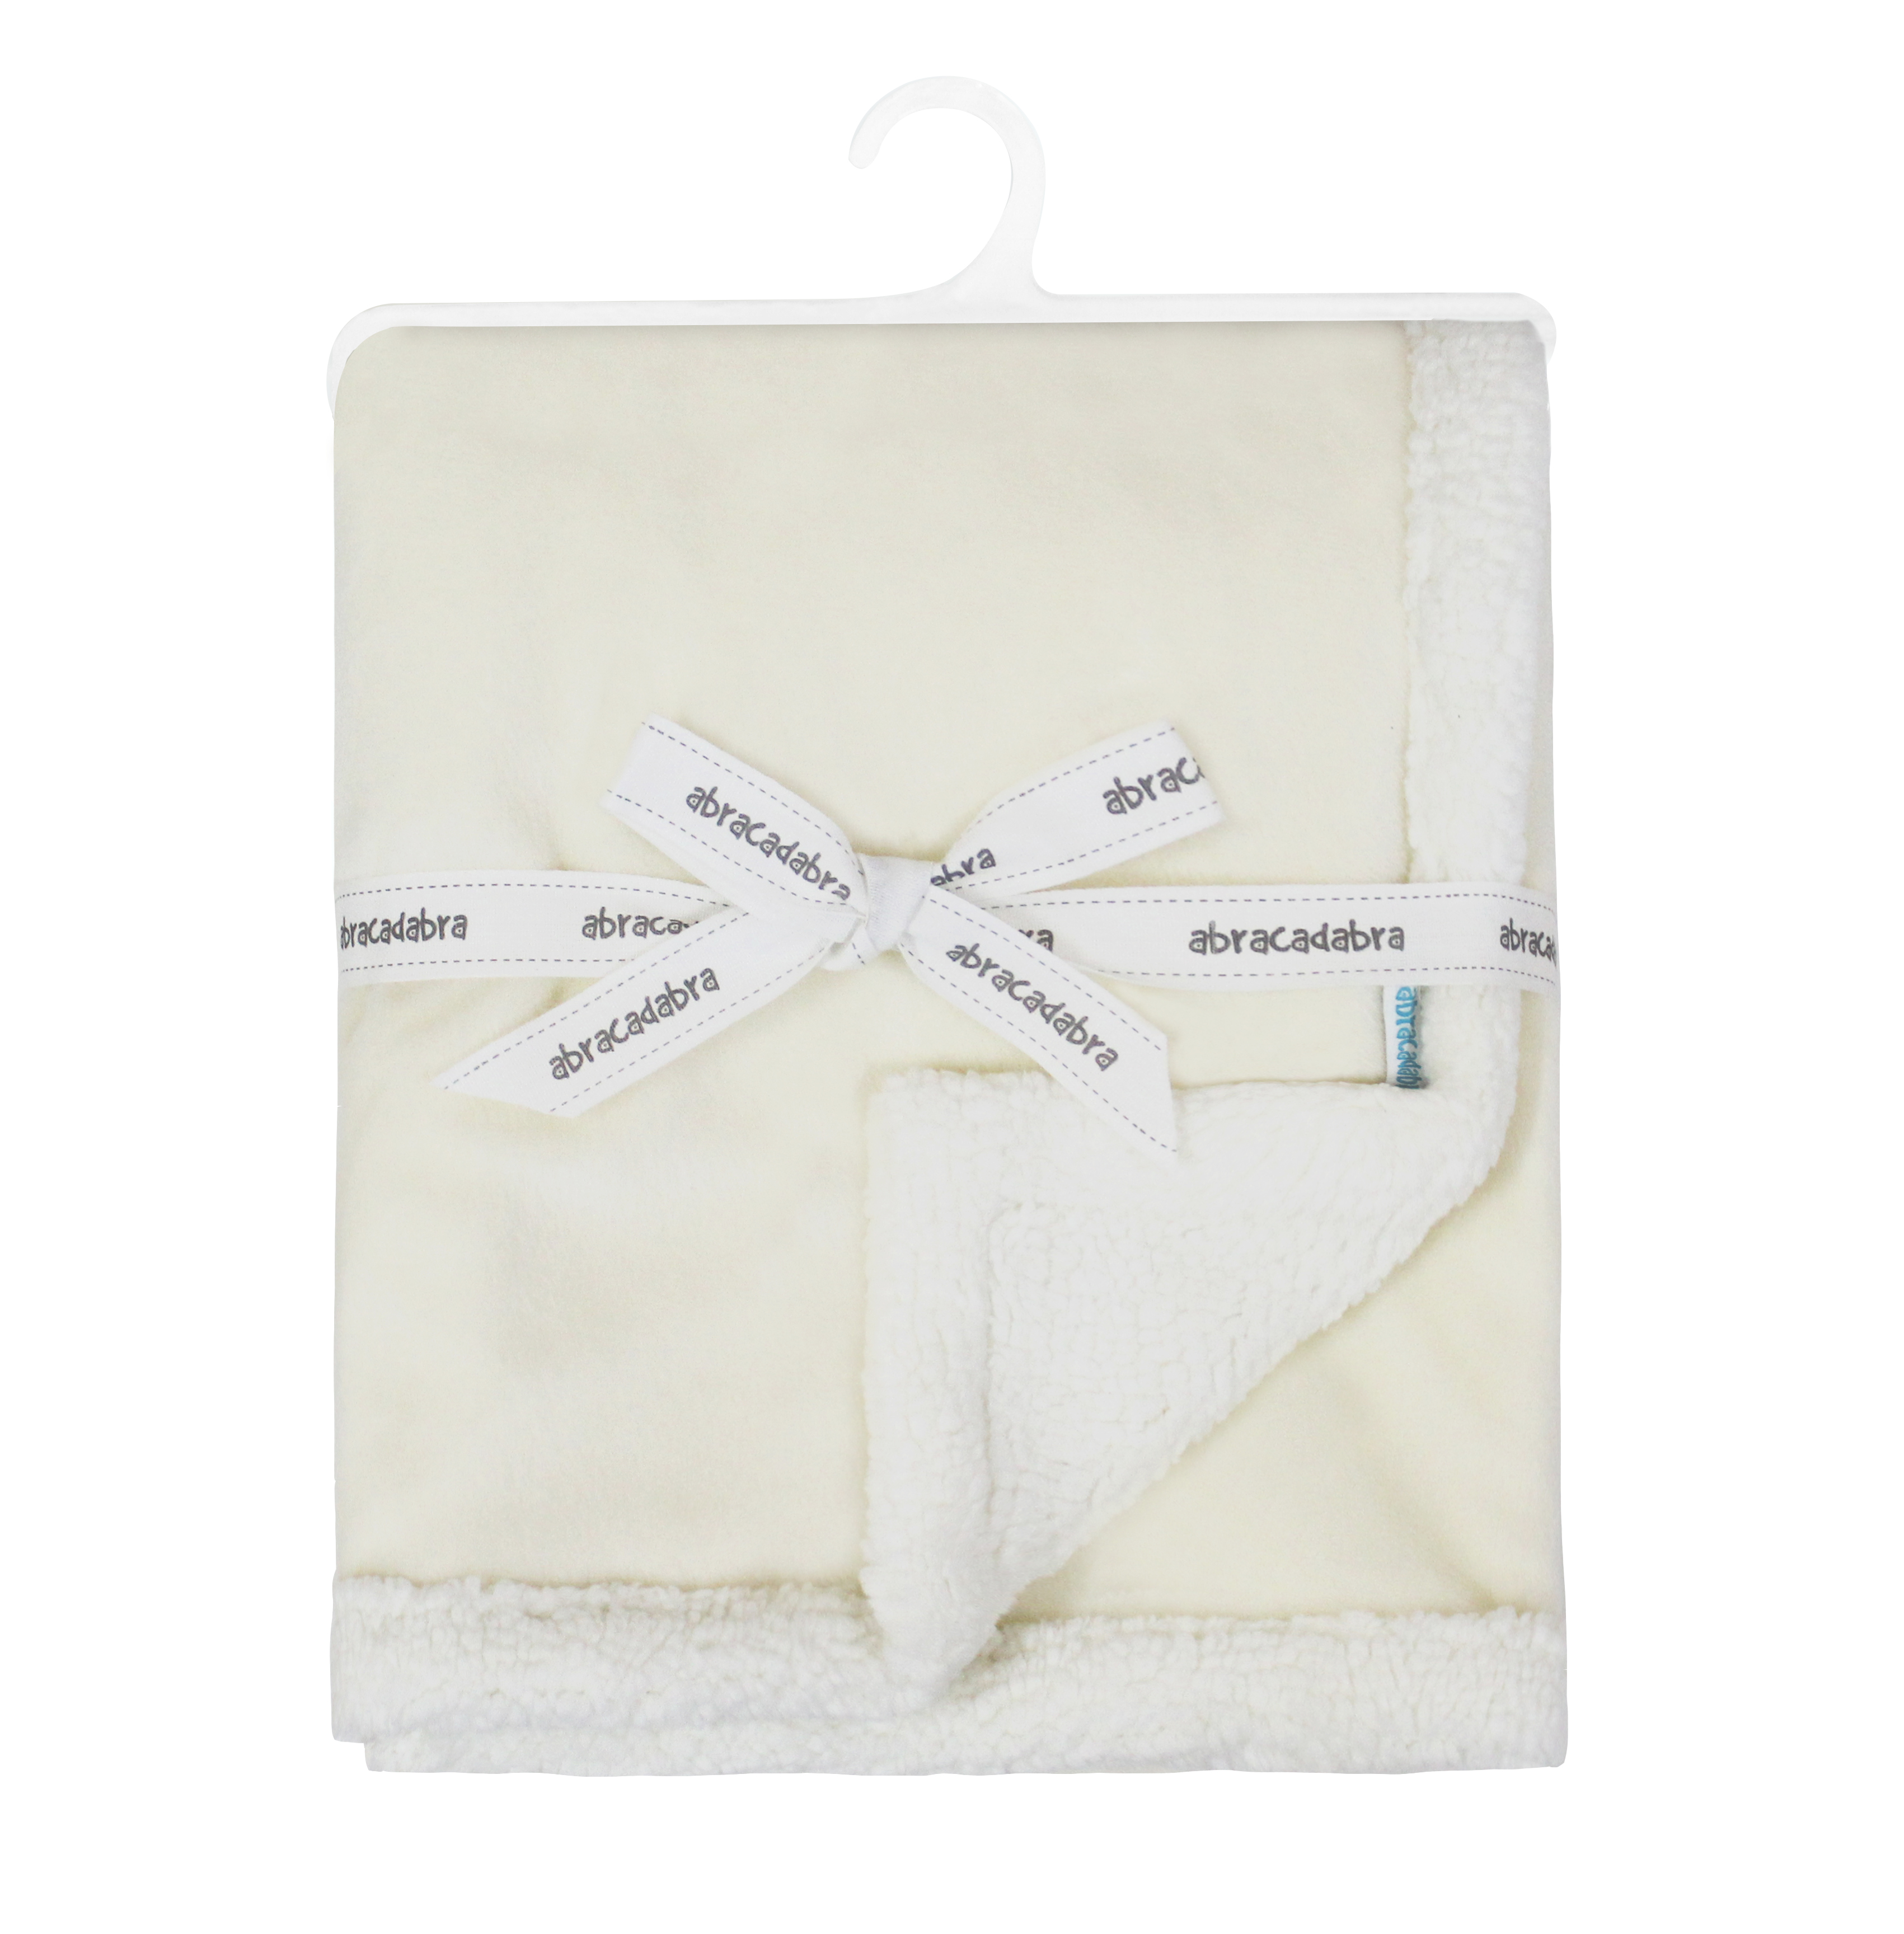 Mothercare | Abracadabra Chamois Blanket - Beige